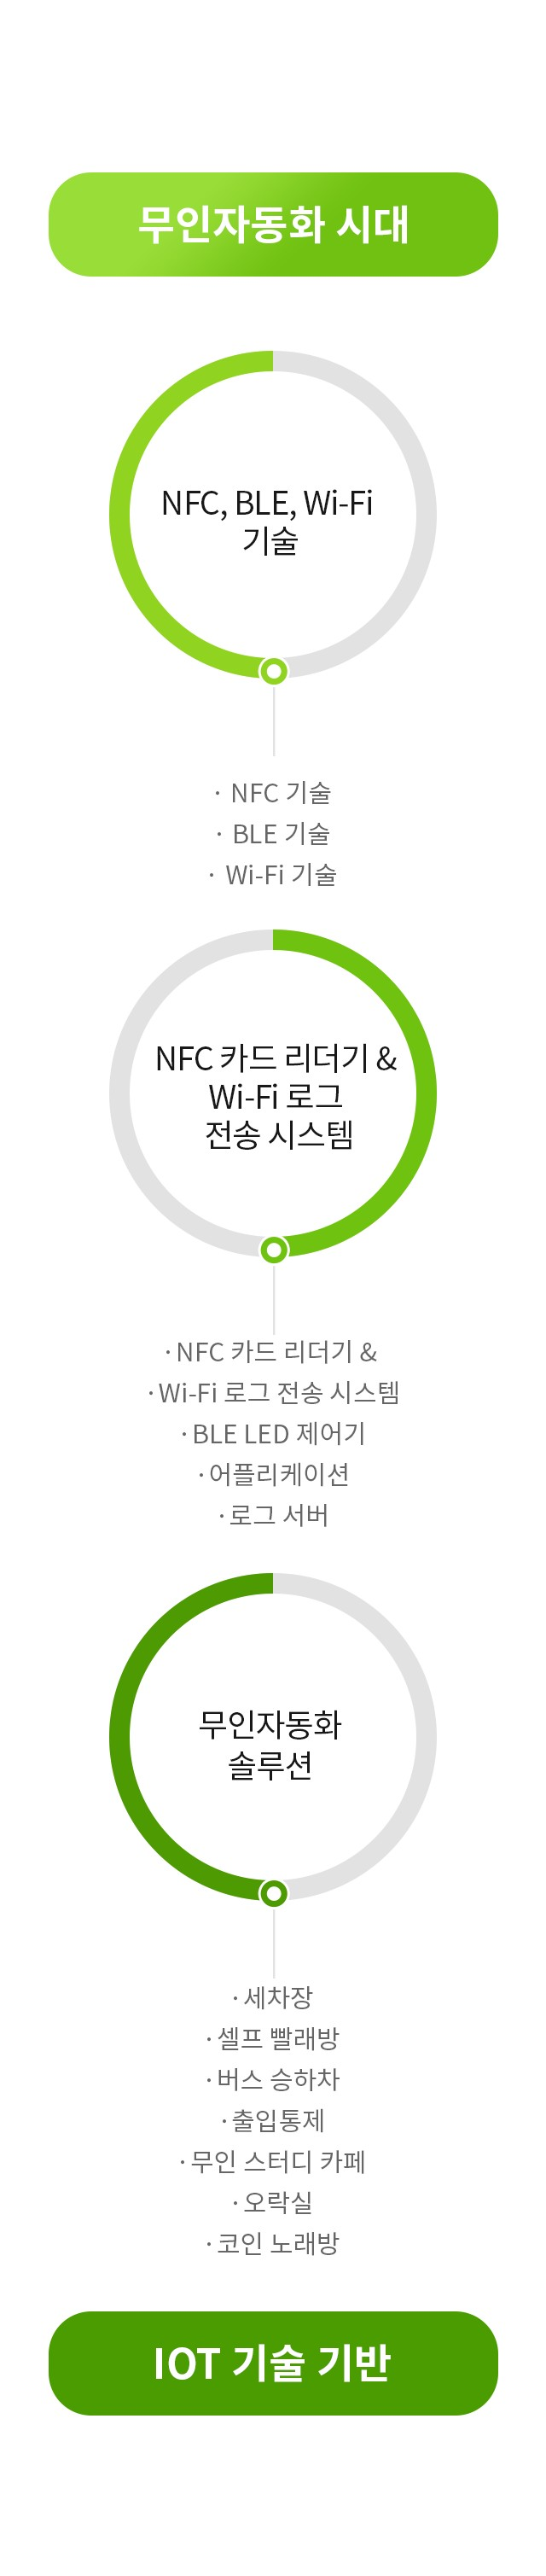 http://www.ttcnc.co.kr/wp-content/uploads/2018/07/ttcnc_sub_vision_mobile.jpg